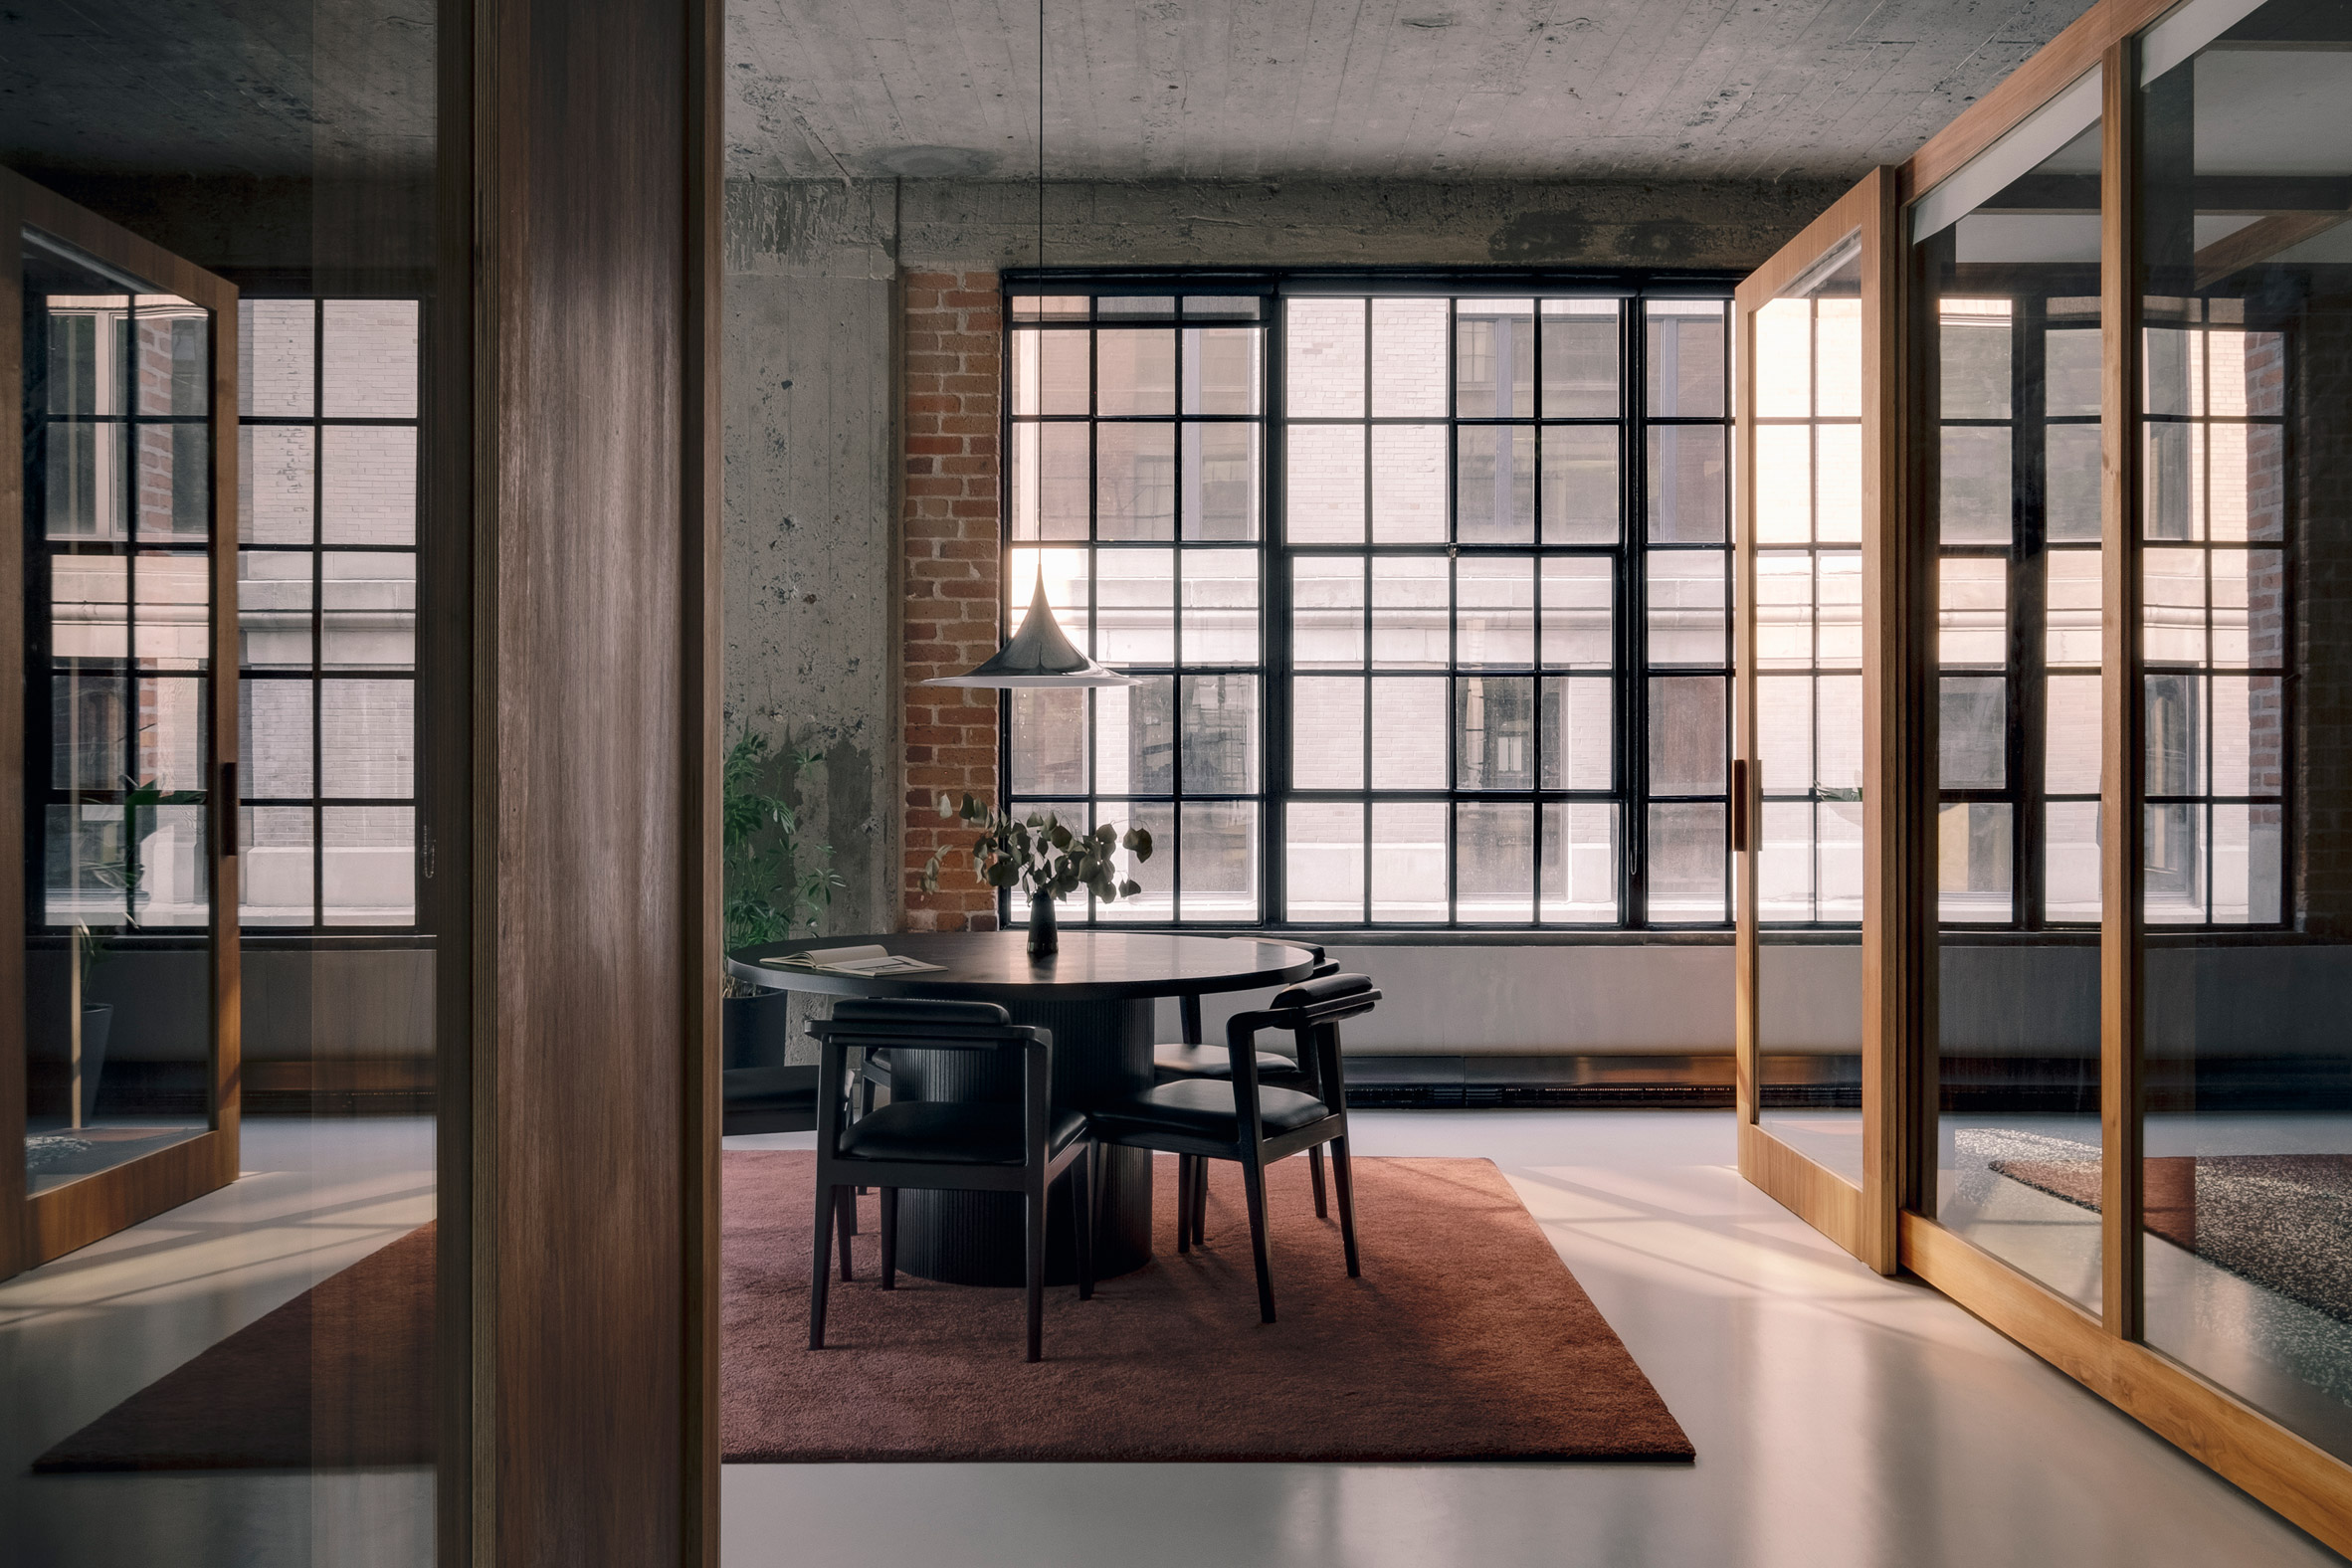 Future Simple Studio renovated the apartment